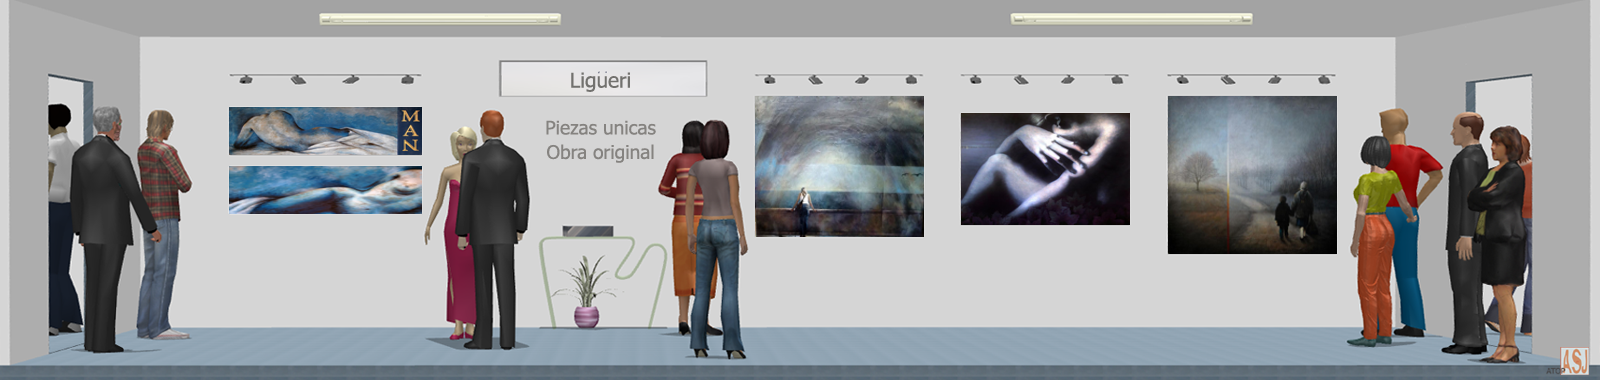 "<img src=""http://2.bp.blogspot.com/-cLtR_ettDAM/UymbwmFKS5I/AAAAAAAAWS0/xaDV2Plk2xo/s1600/sala_de_exposicion_de_lig%C3%BCeri.png"" alt=""Sala de Exposición virtual de pinturas de Ligüeri""/>"